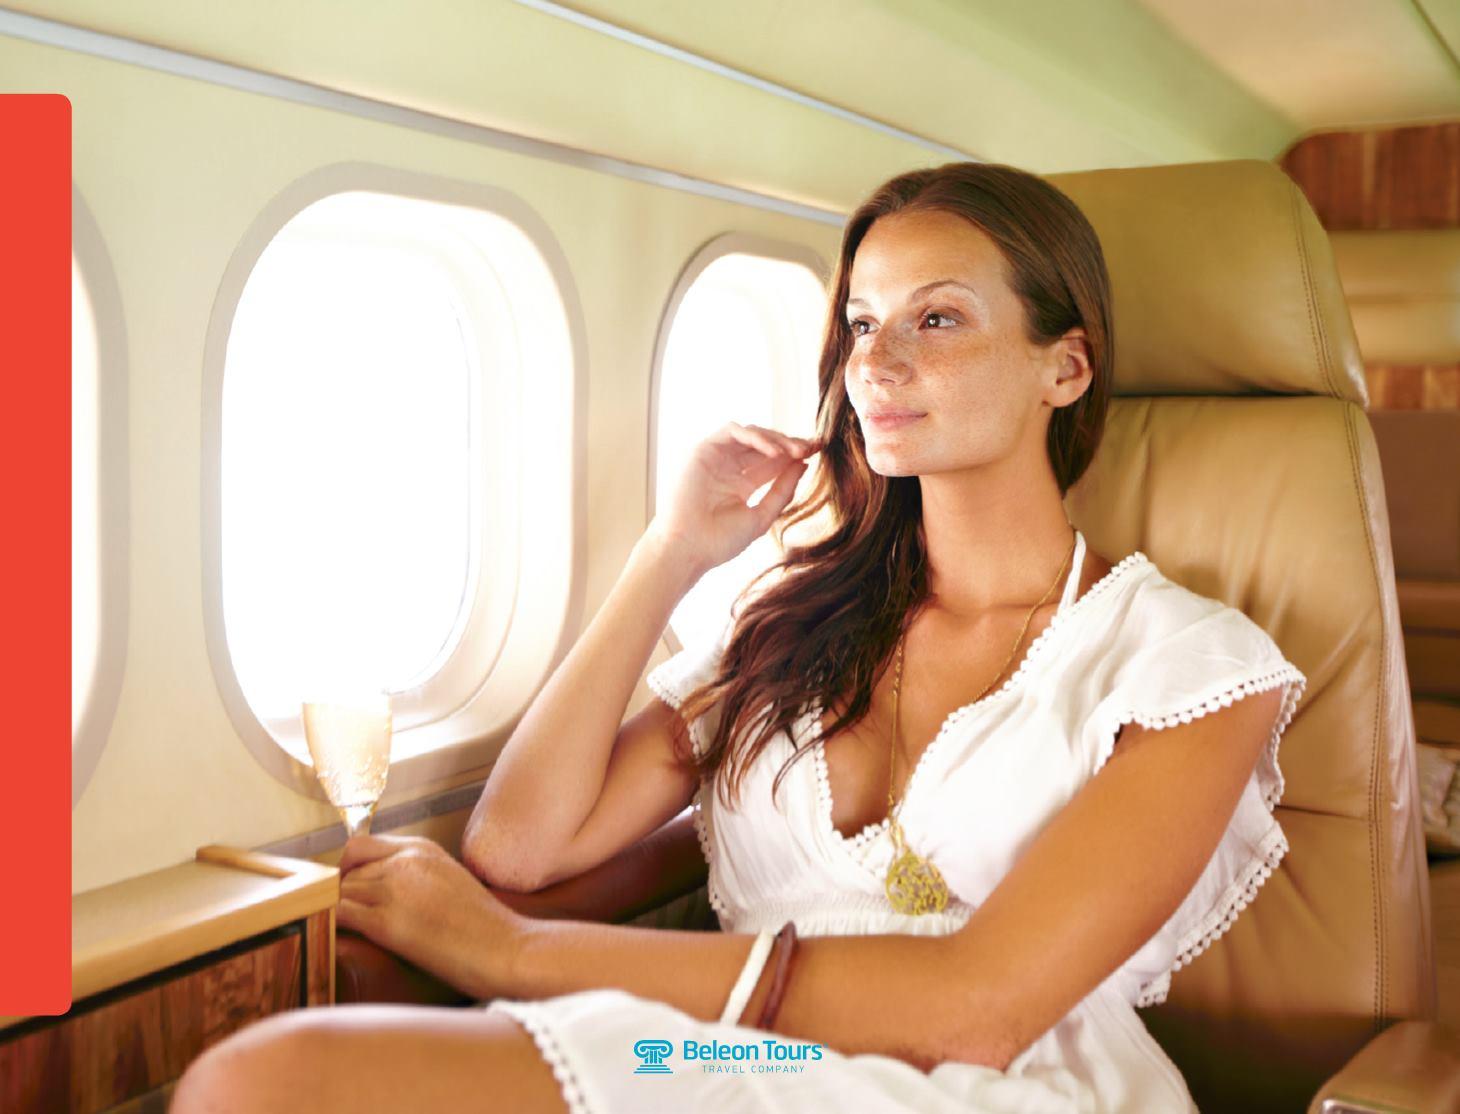 Фото девушек на борту самолета фалькон